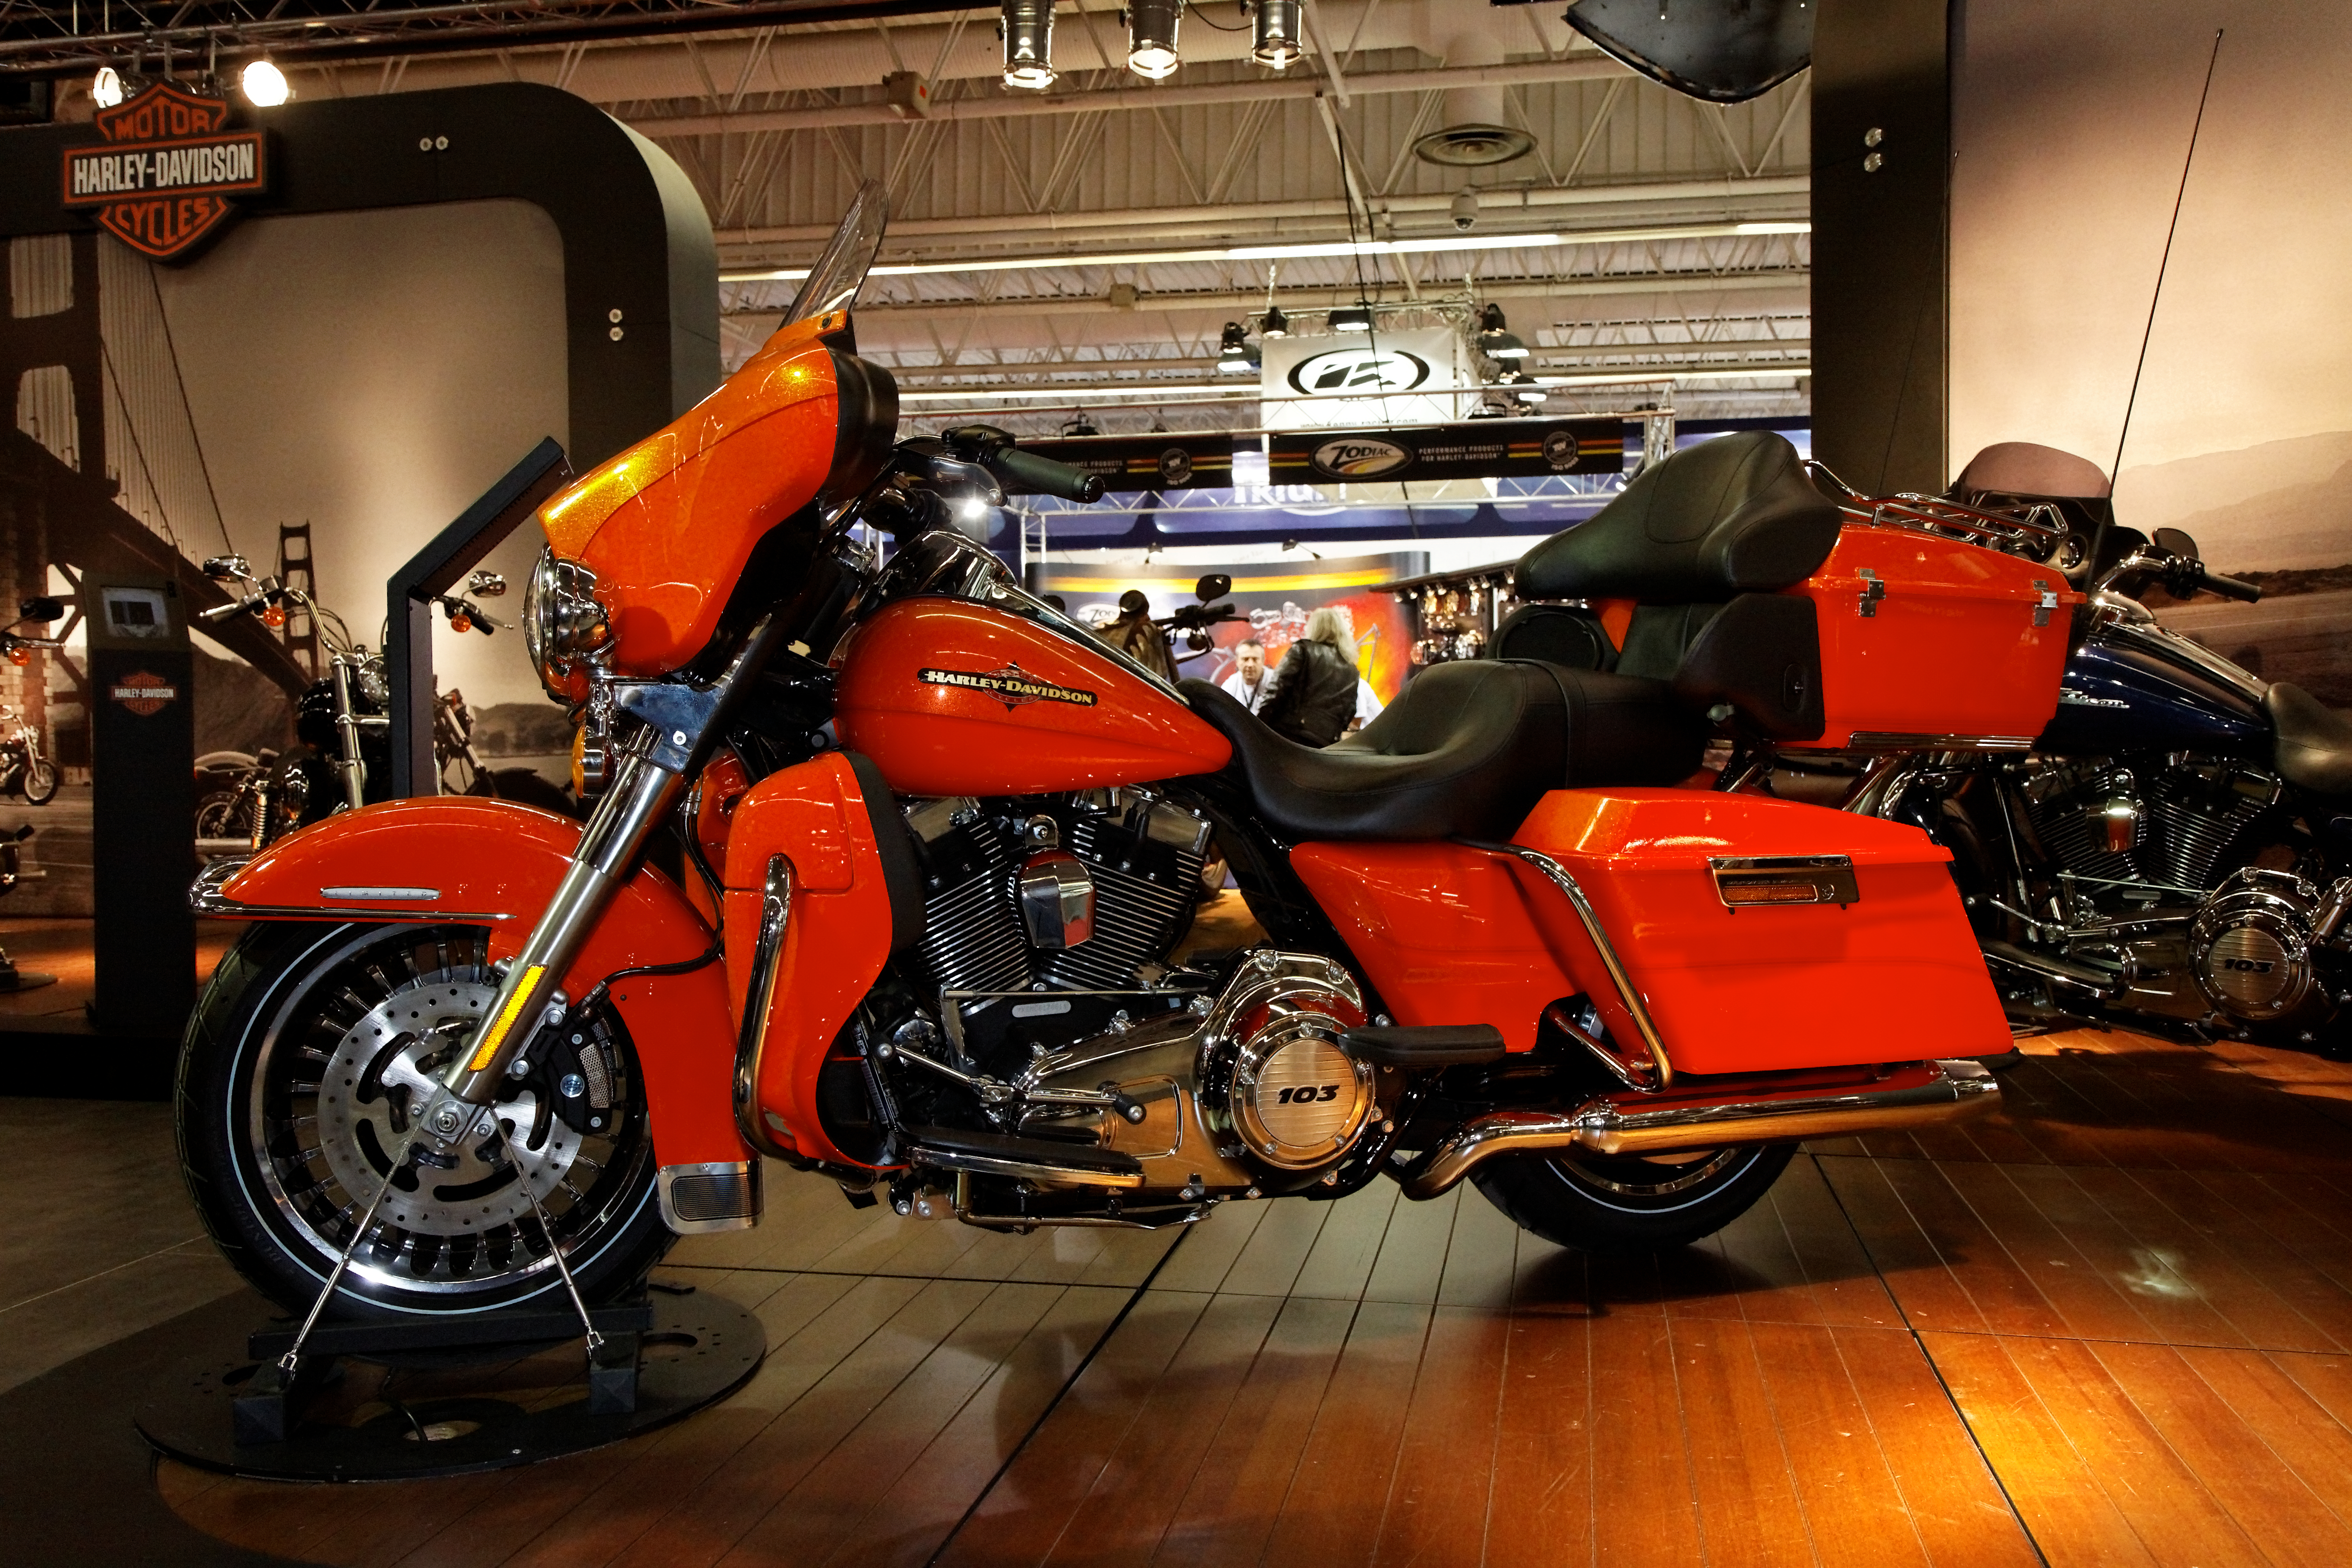 File:Paris - Salon de la moto 2011 - Harley-Davidson - FLHTK Electra